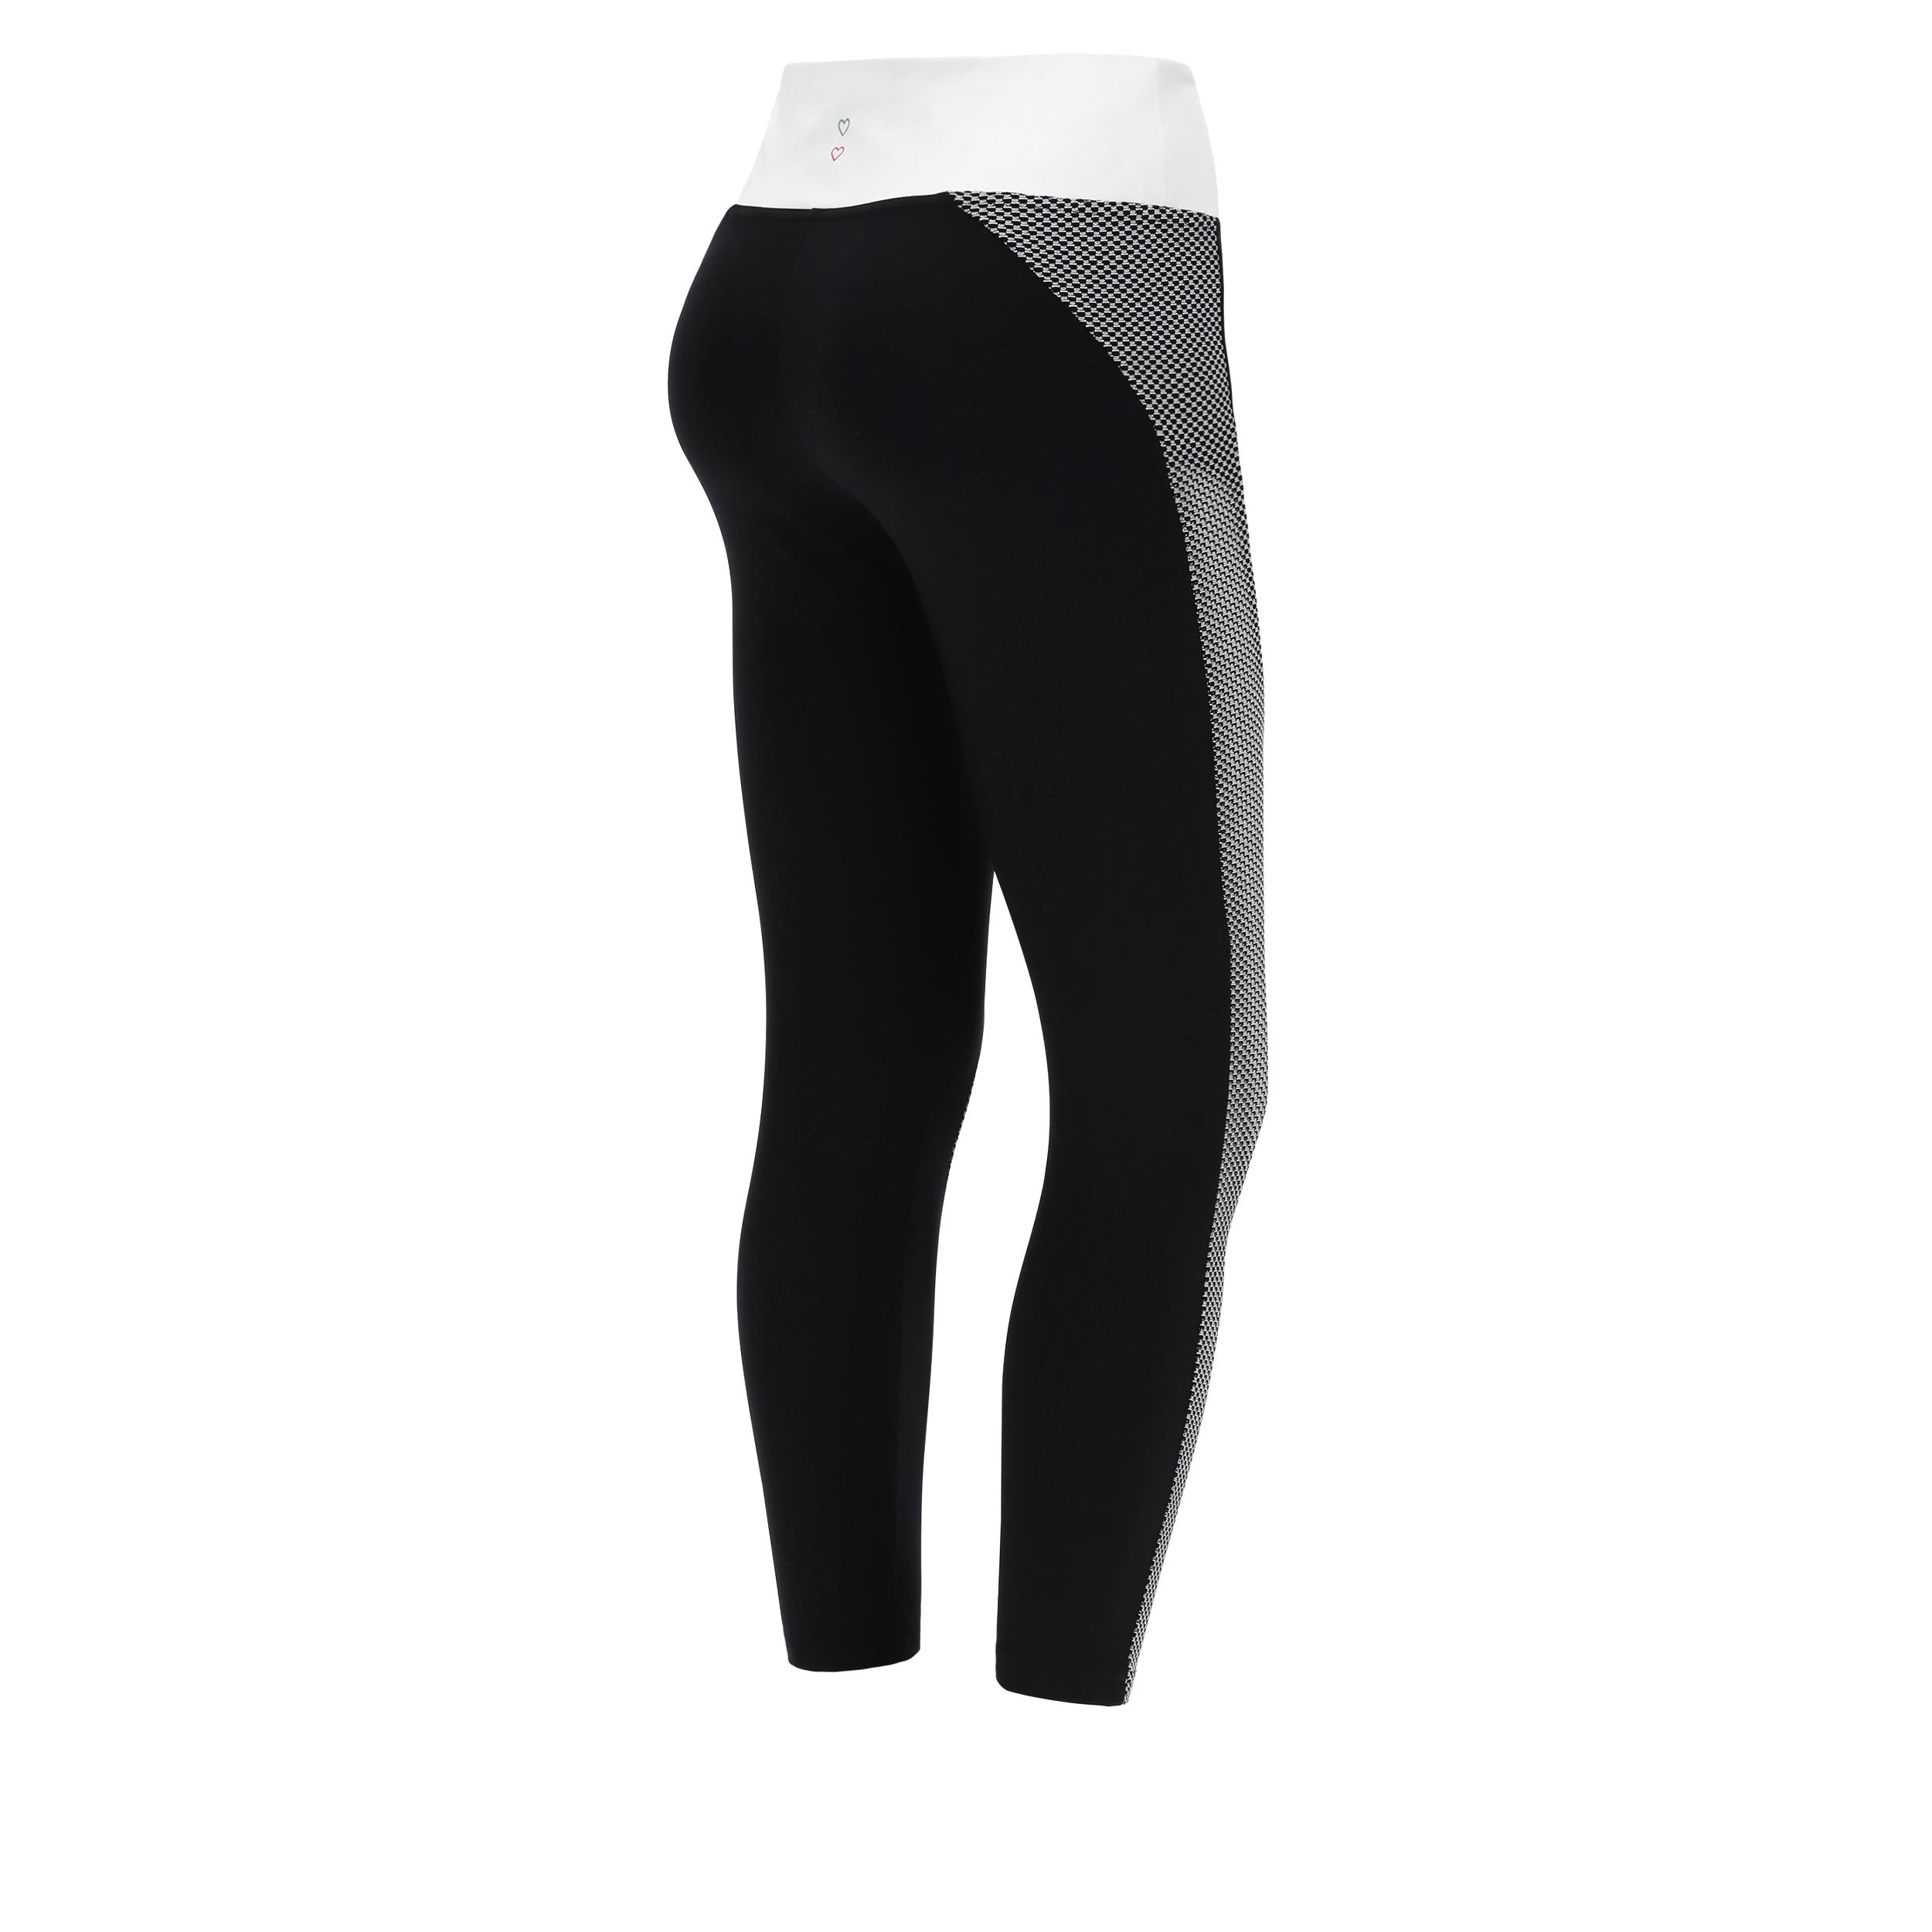 Pantaloni yoga donna Leggings SuperFit - 100% Made in Italy